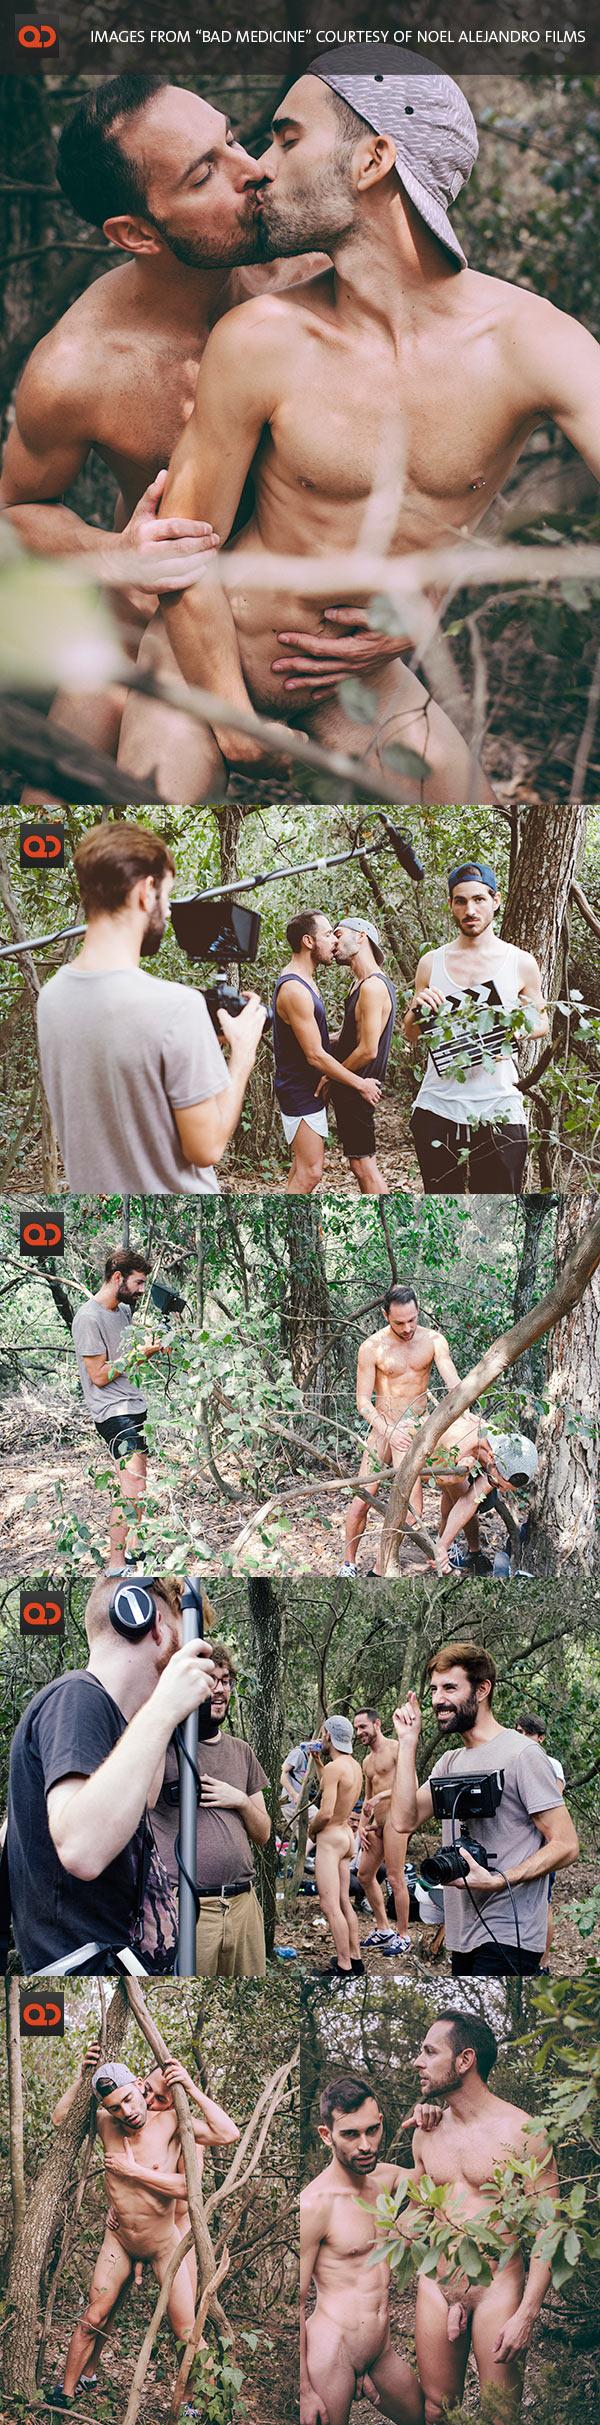 "Exclusive: QC Interviews Noel Alejandro, The Director Of ""Doing Elliot"""